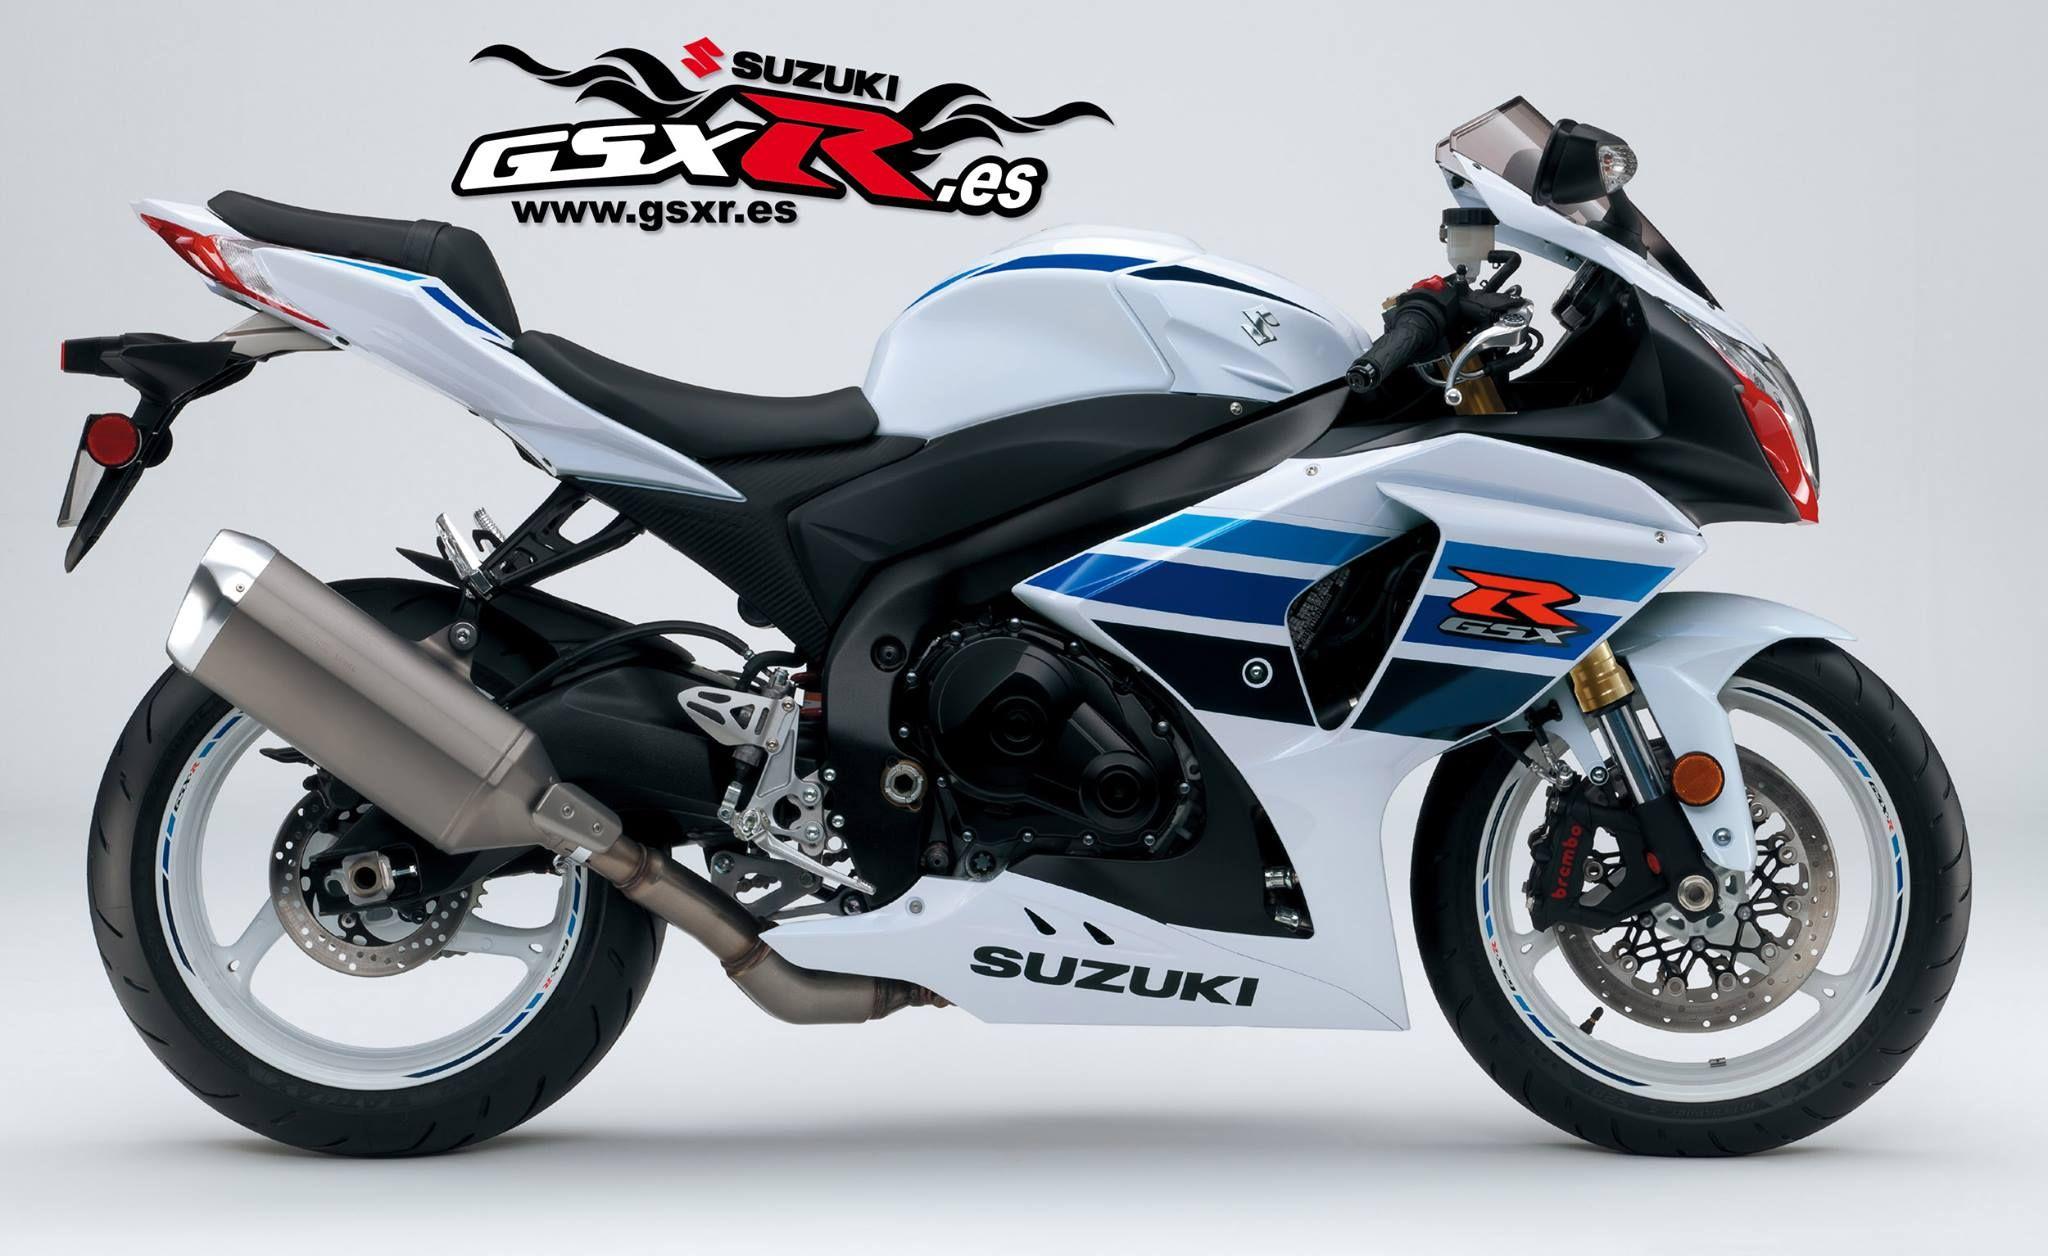 Indonesia akan kedatangan motor sport suzuki 150cc